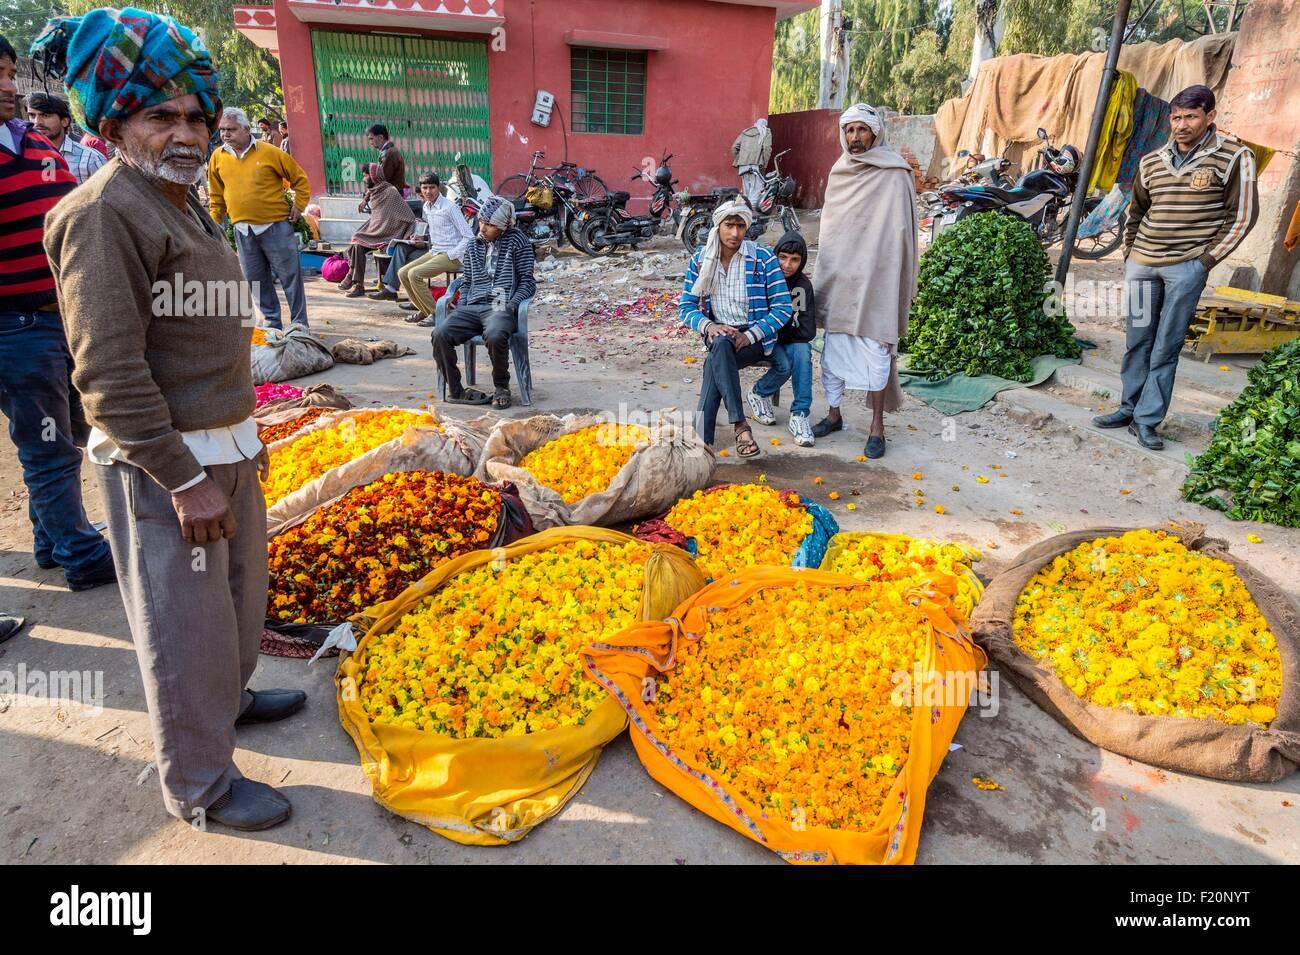 India, Rajasthan state, Jaipur, Chandi Ki Taksal flower market Stock Photo